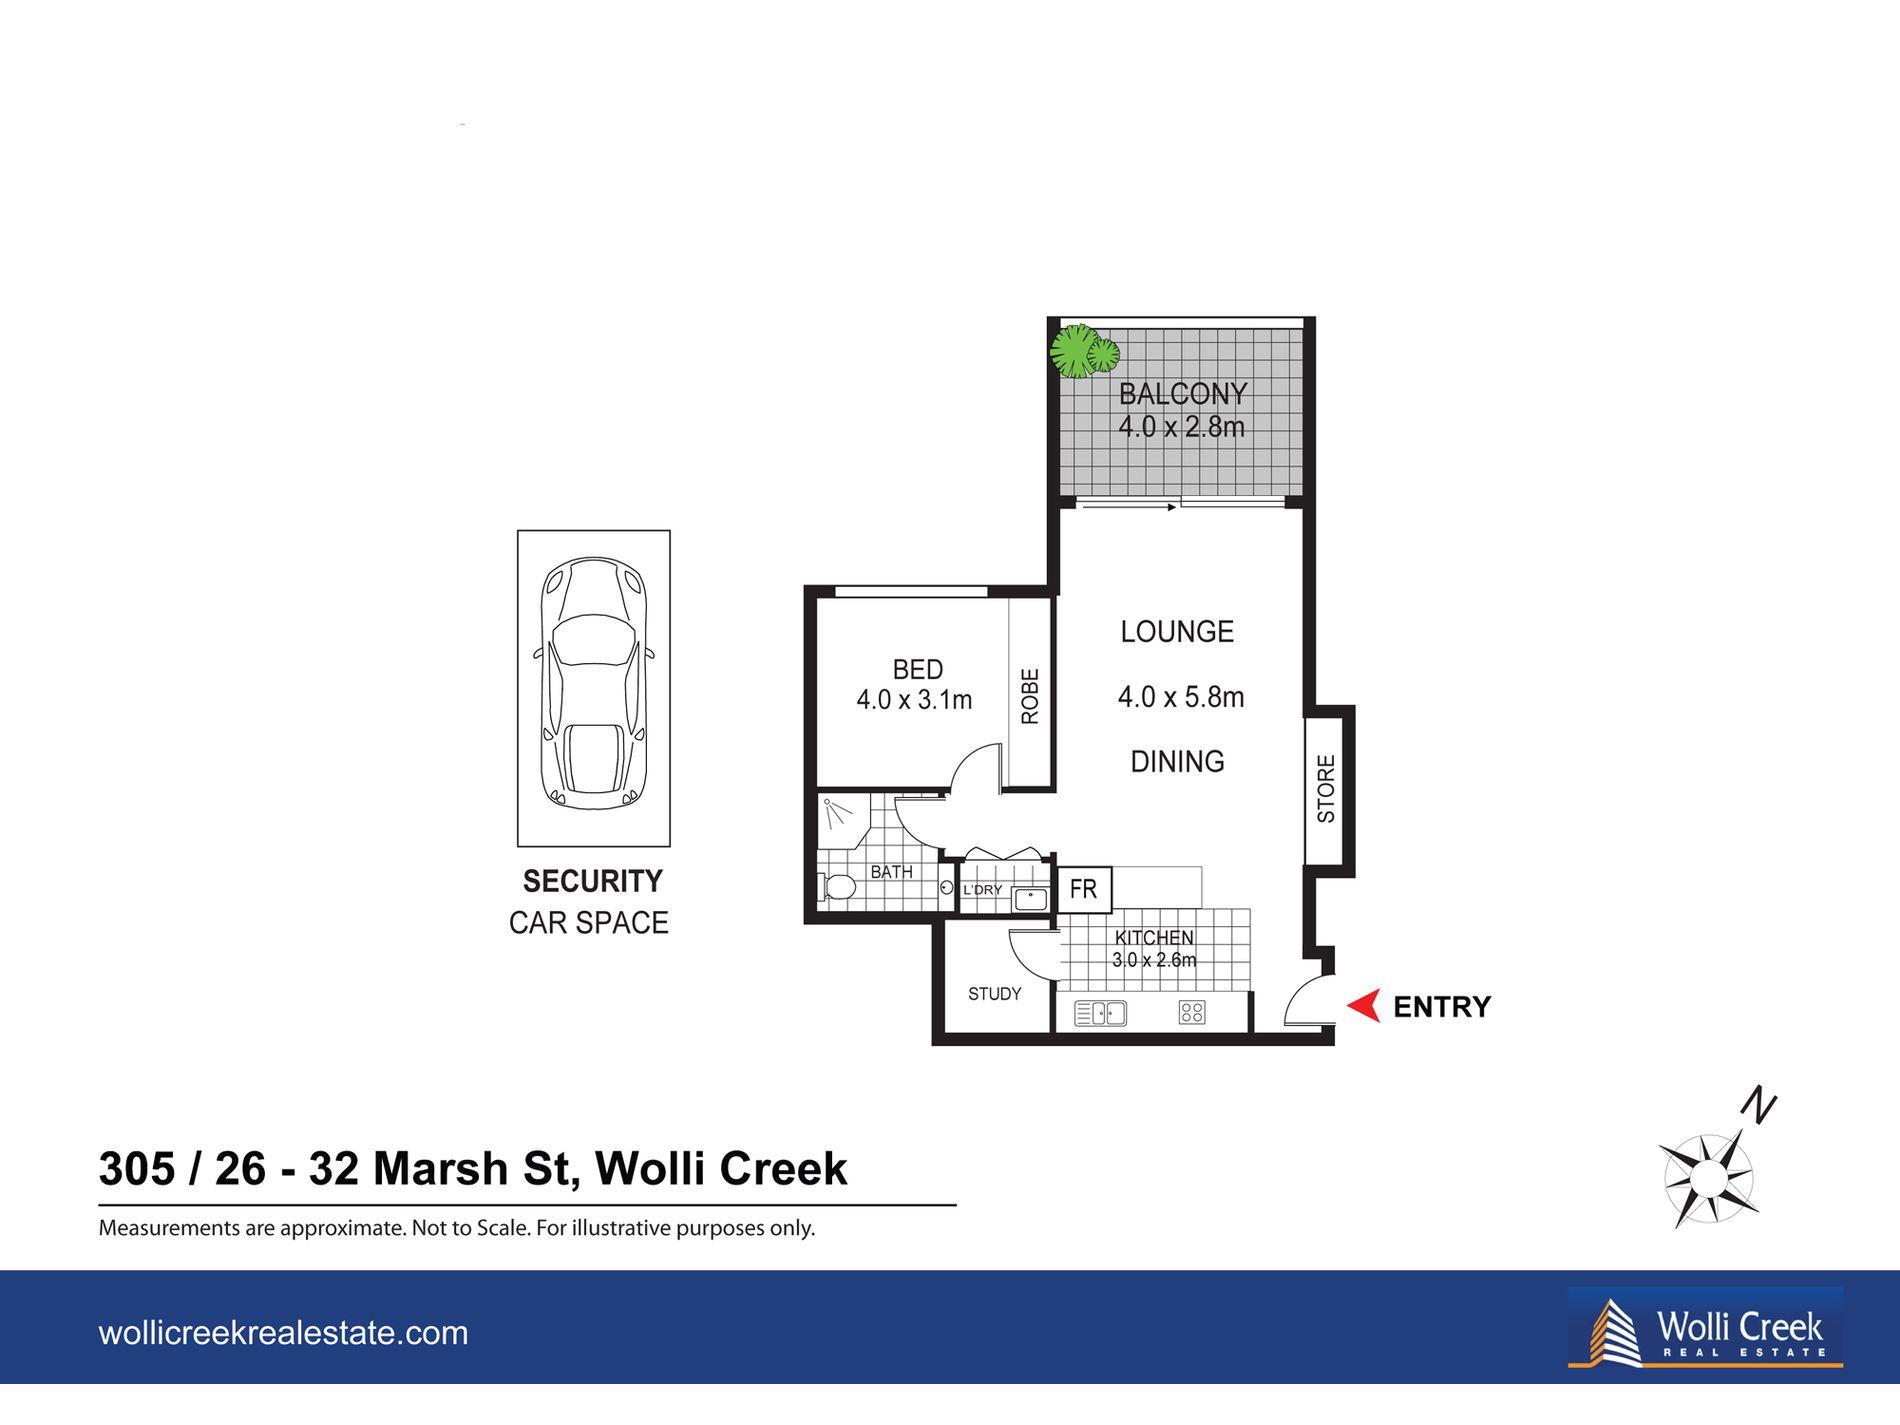 305 / 26-32 Marsh Street, Wolli Creek